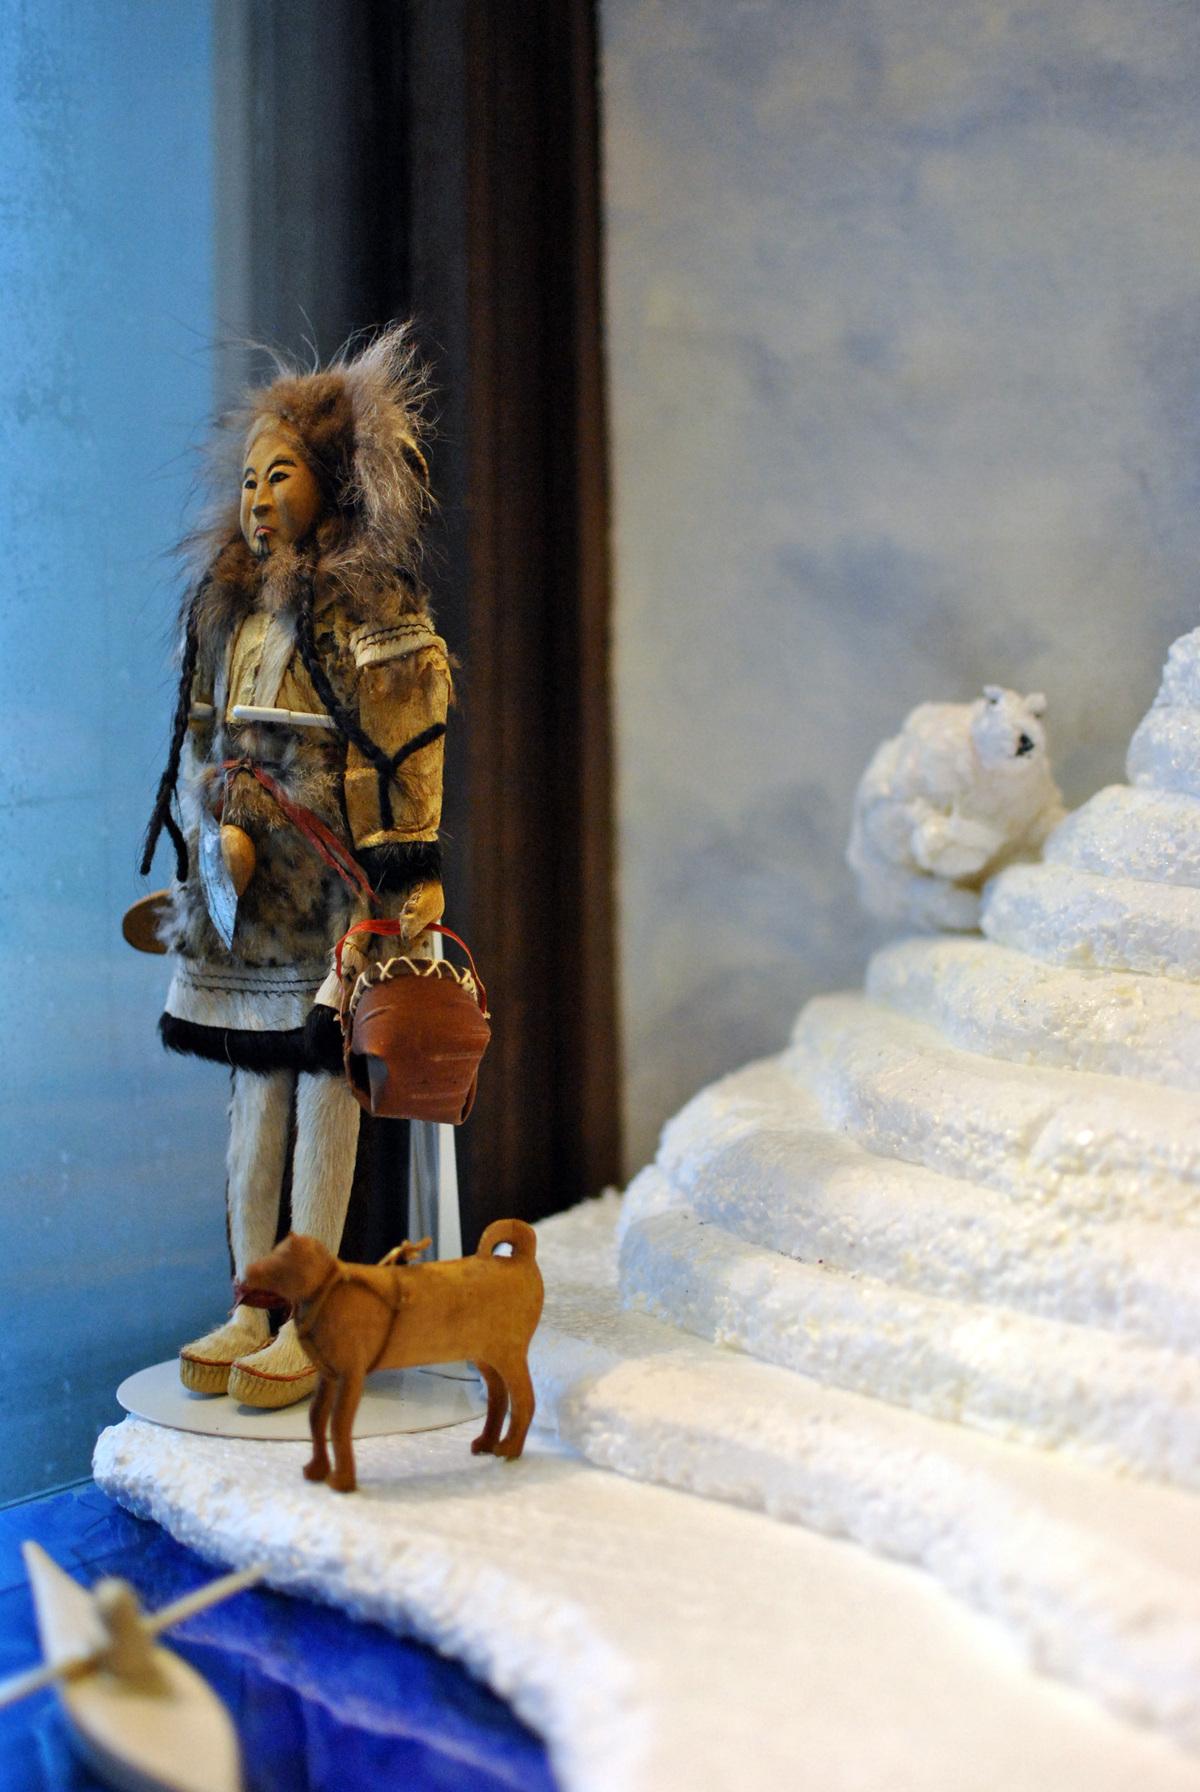 Inuit Doll (female) and Sled Dog